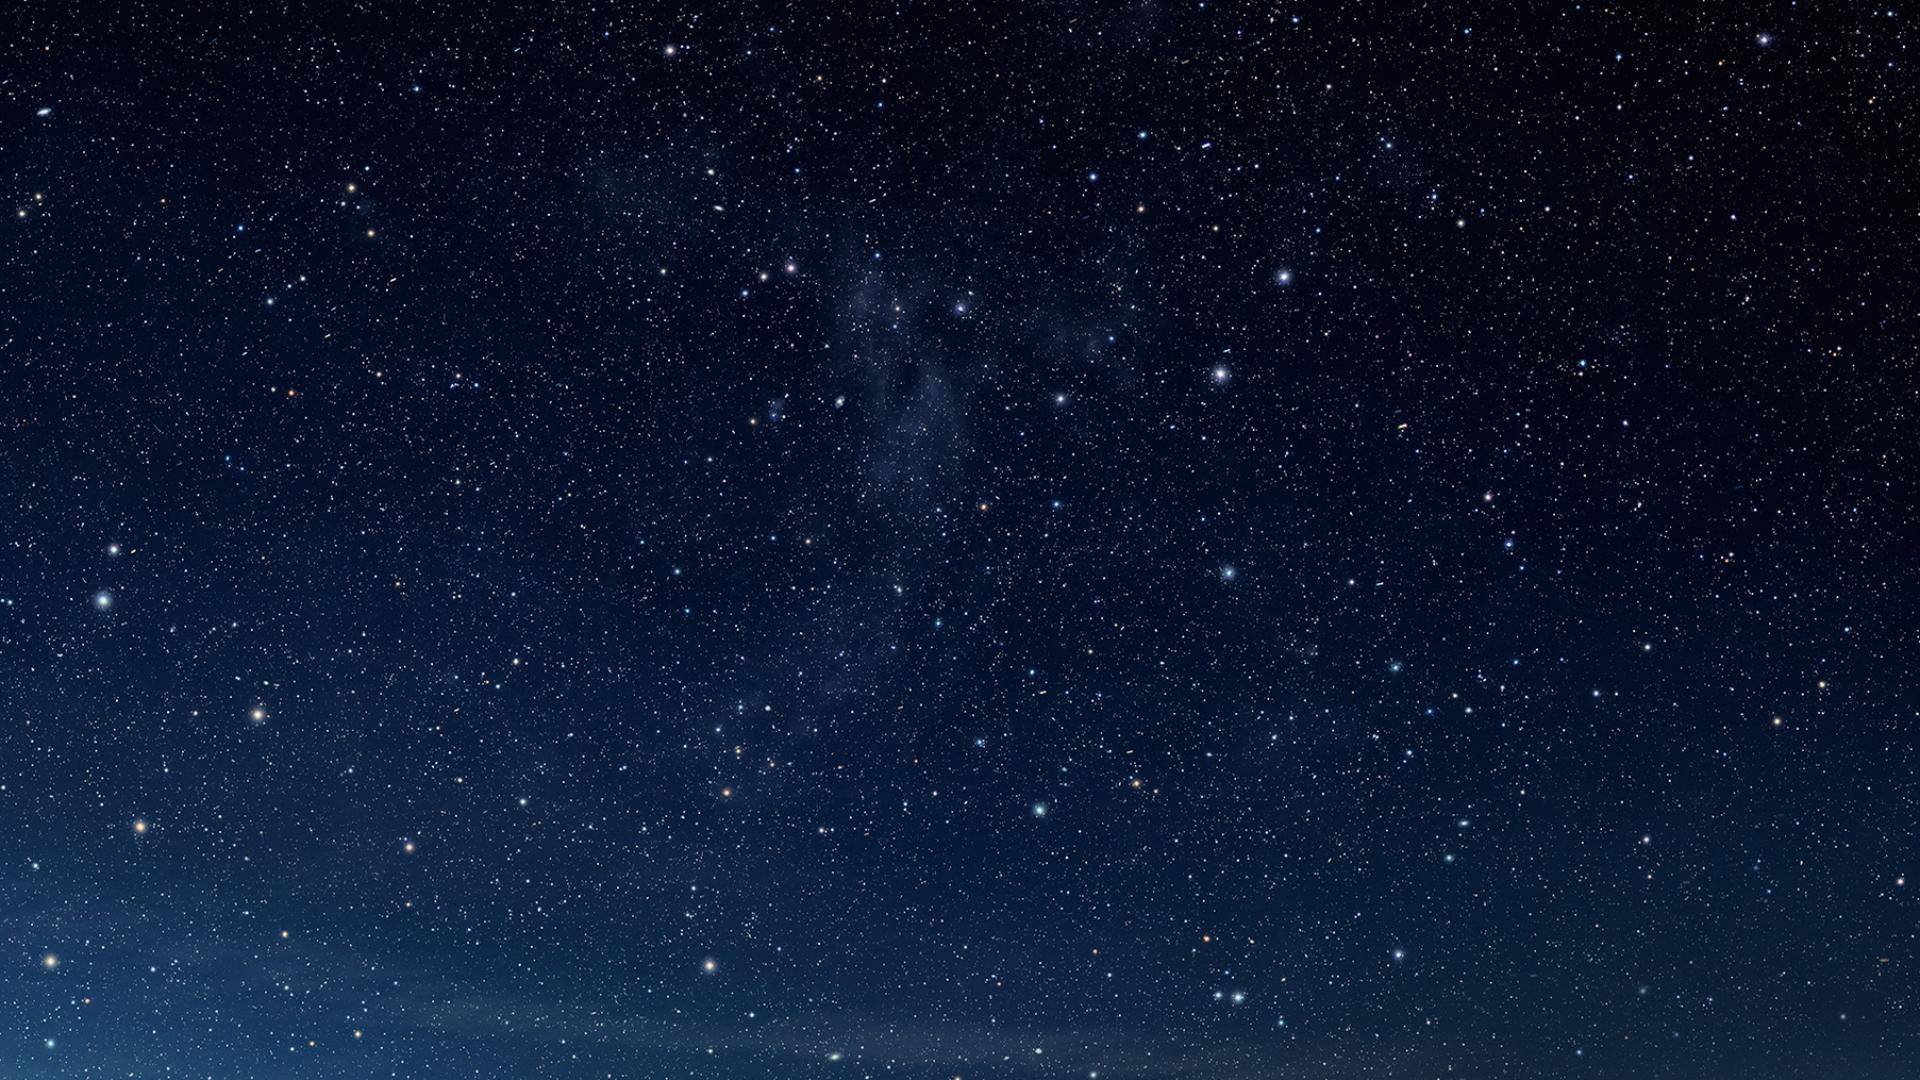 صور خلفيات نجوم , شاهد بالصور اجمل خلفيات للمشاهير